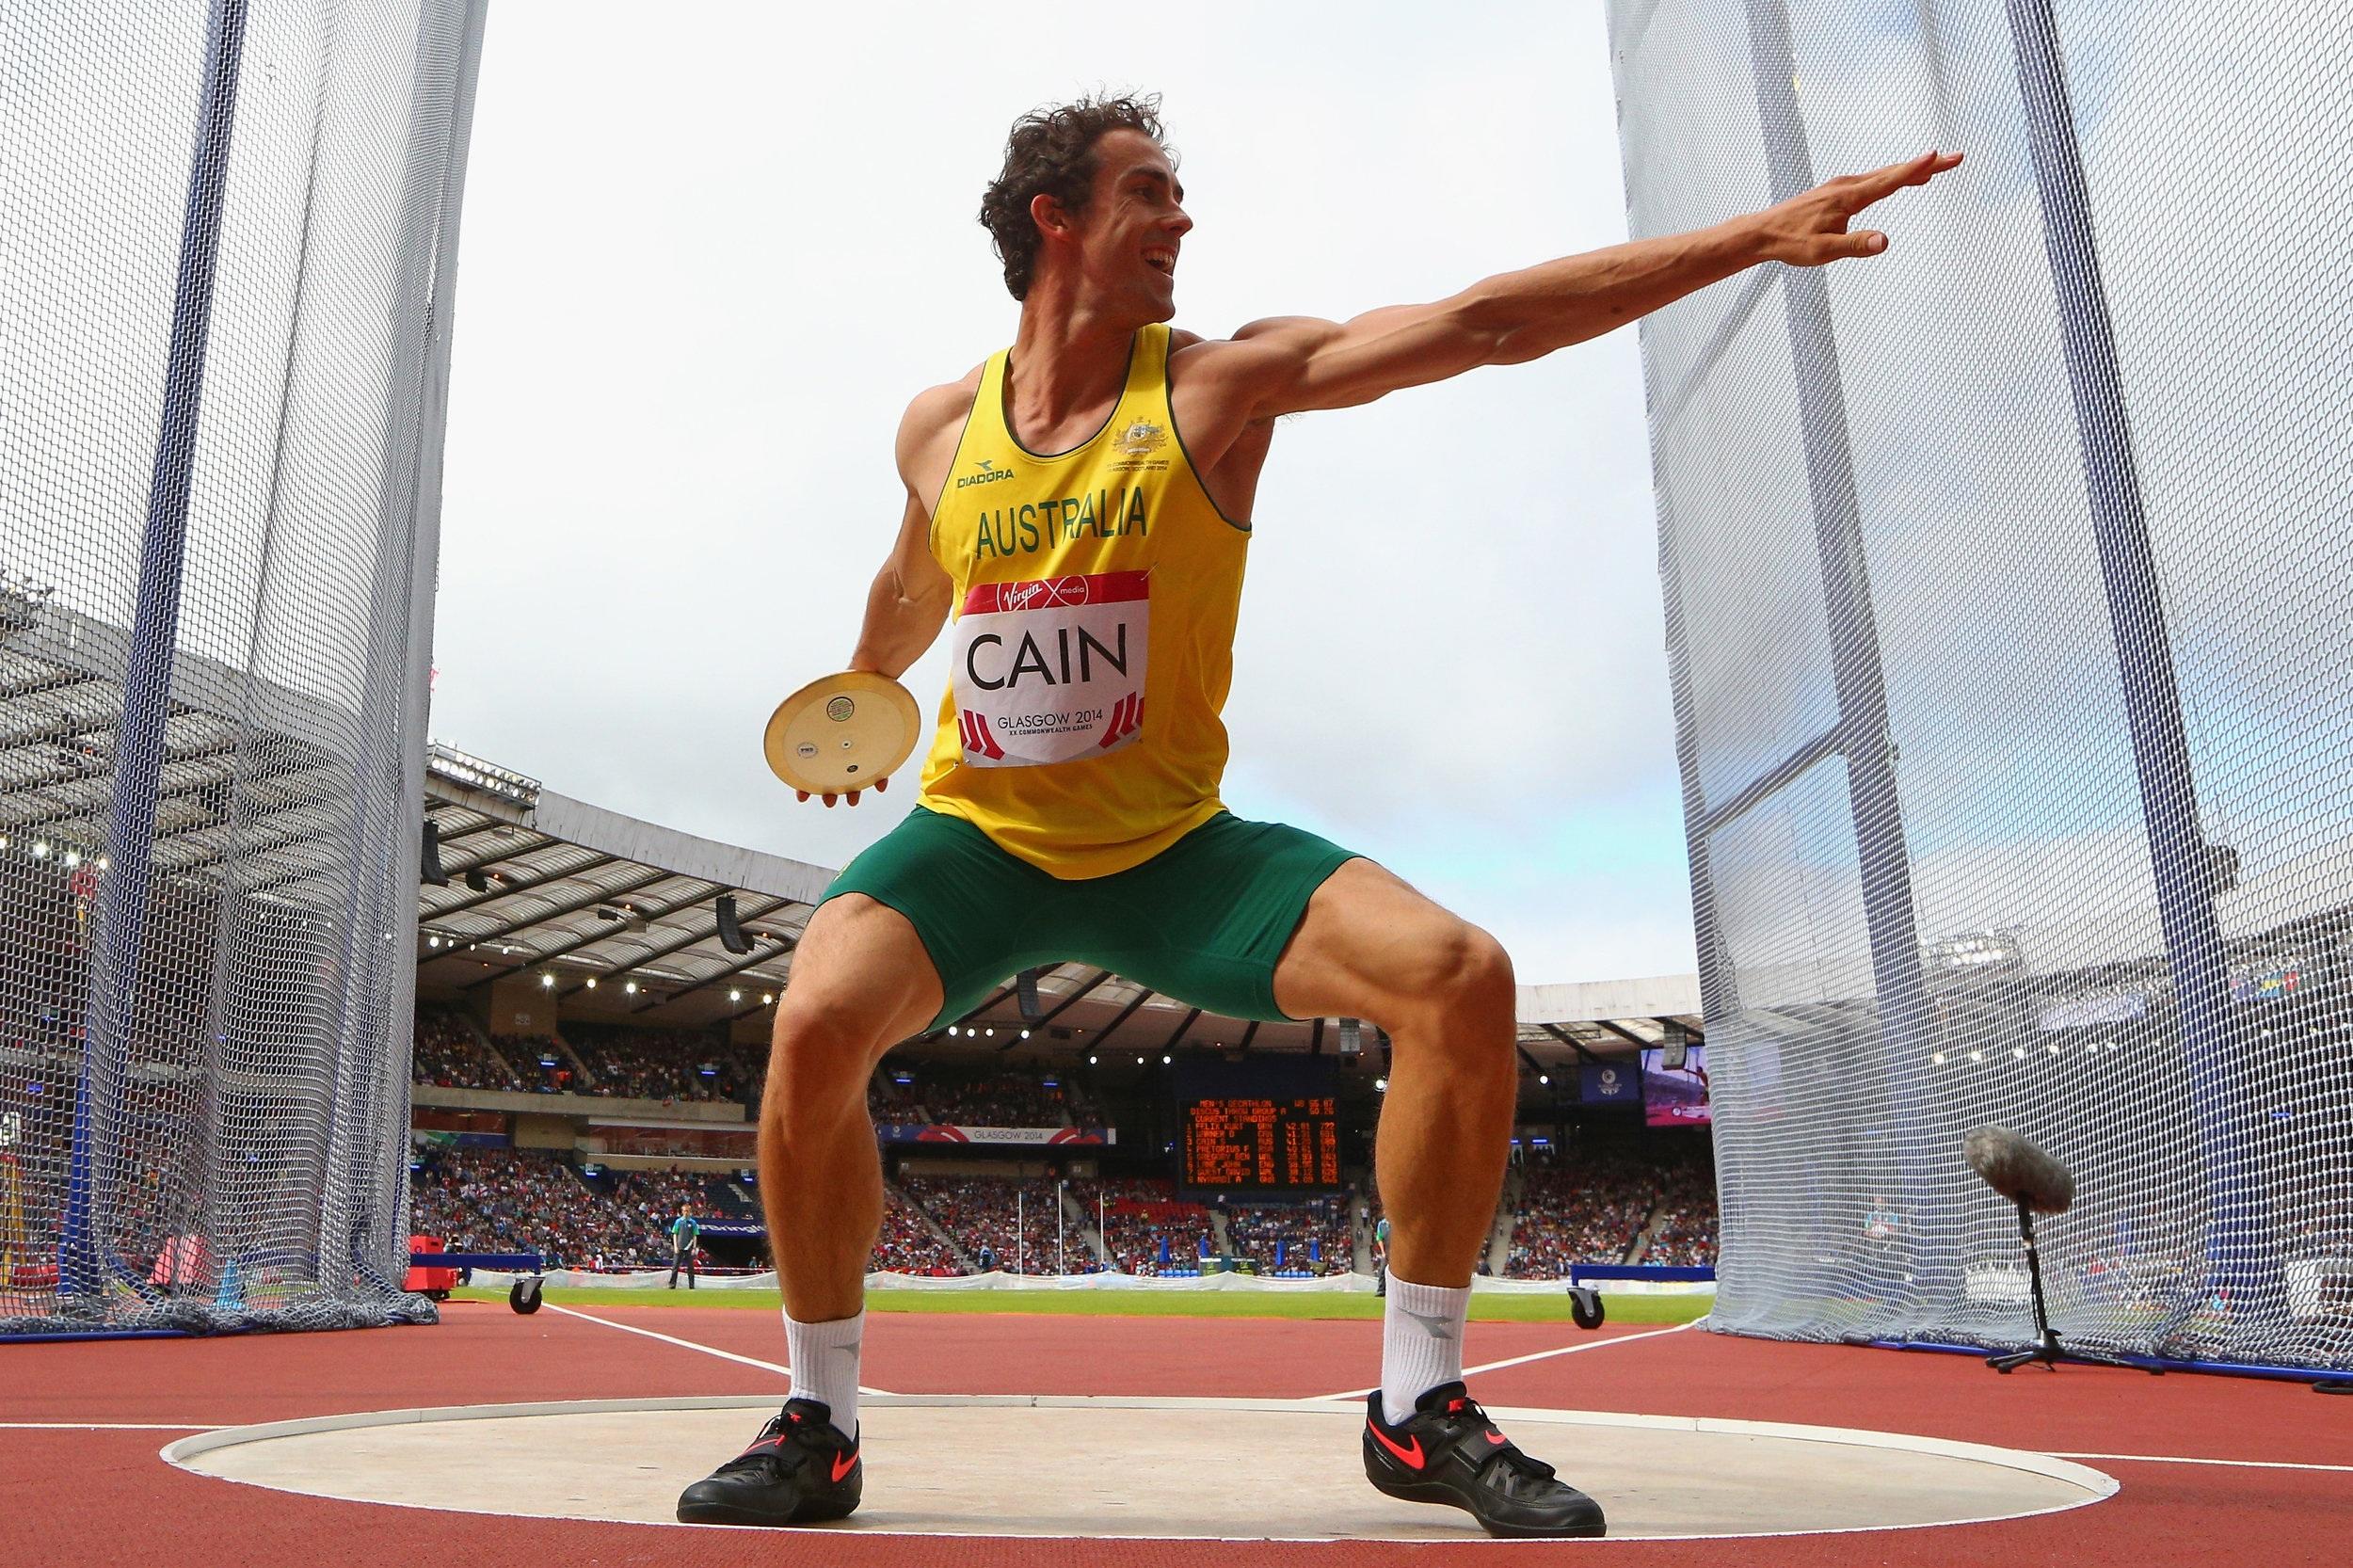 STEVE CAIN - Head Coach of MULTUS Performance CoachingRepresentative at the 2014 Commonwealth GamesAthletics Australia National Junior CoachLearn more about Steve